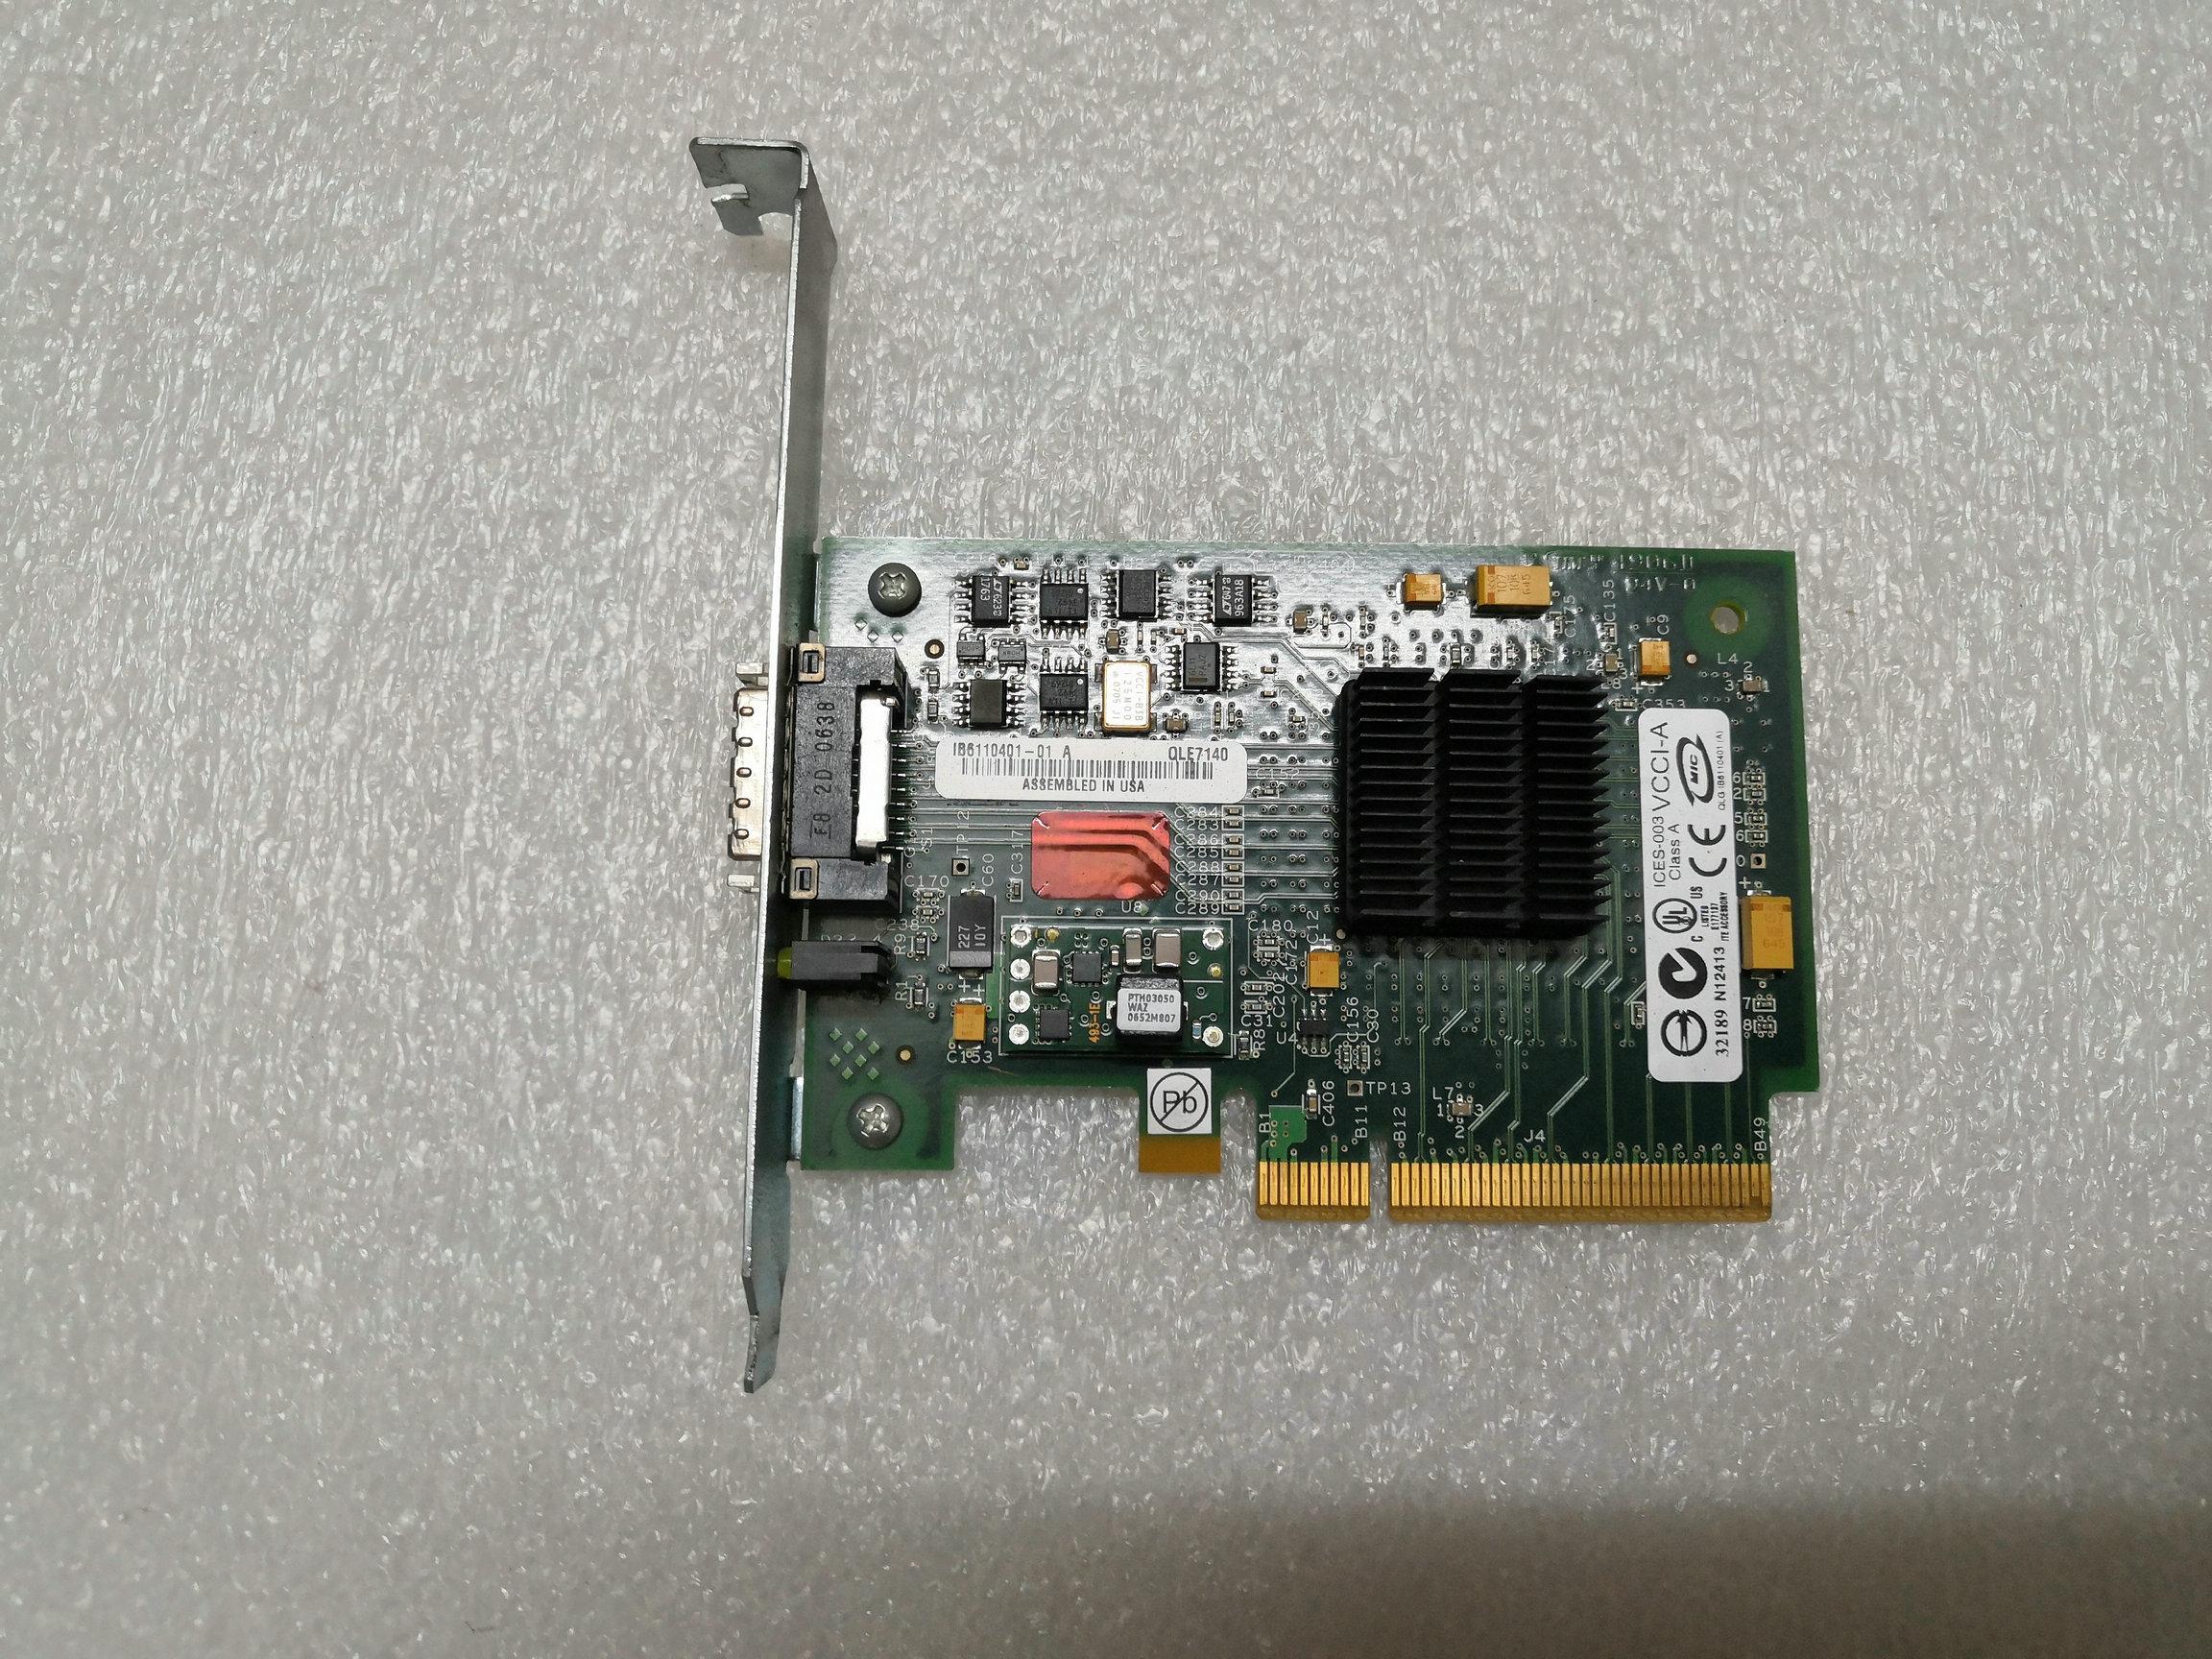 QLE7140 QLOGIC QLE 7140 10 Gb INFINIBAND CX4 4X% 100 Çalışma orijinal